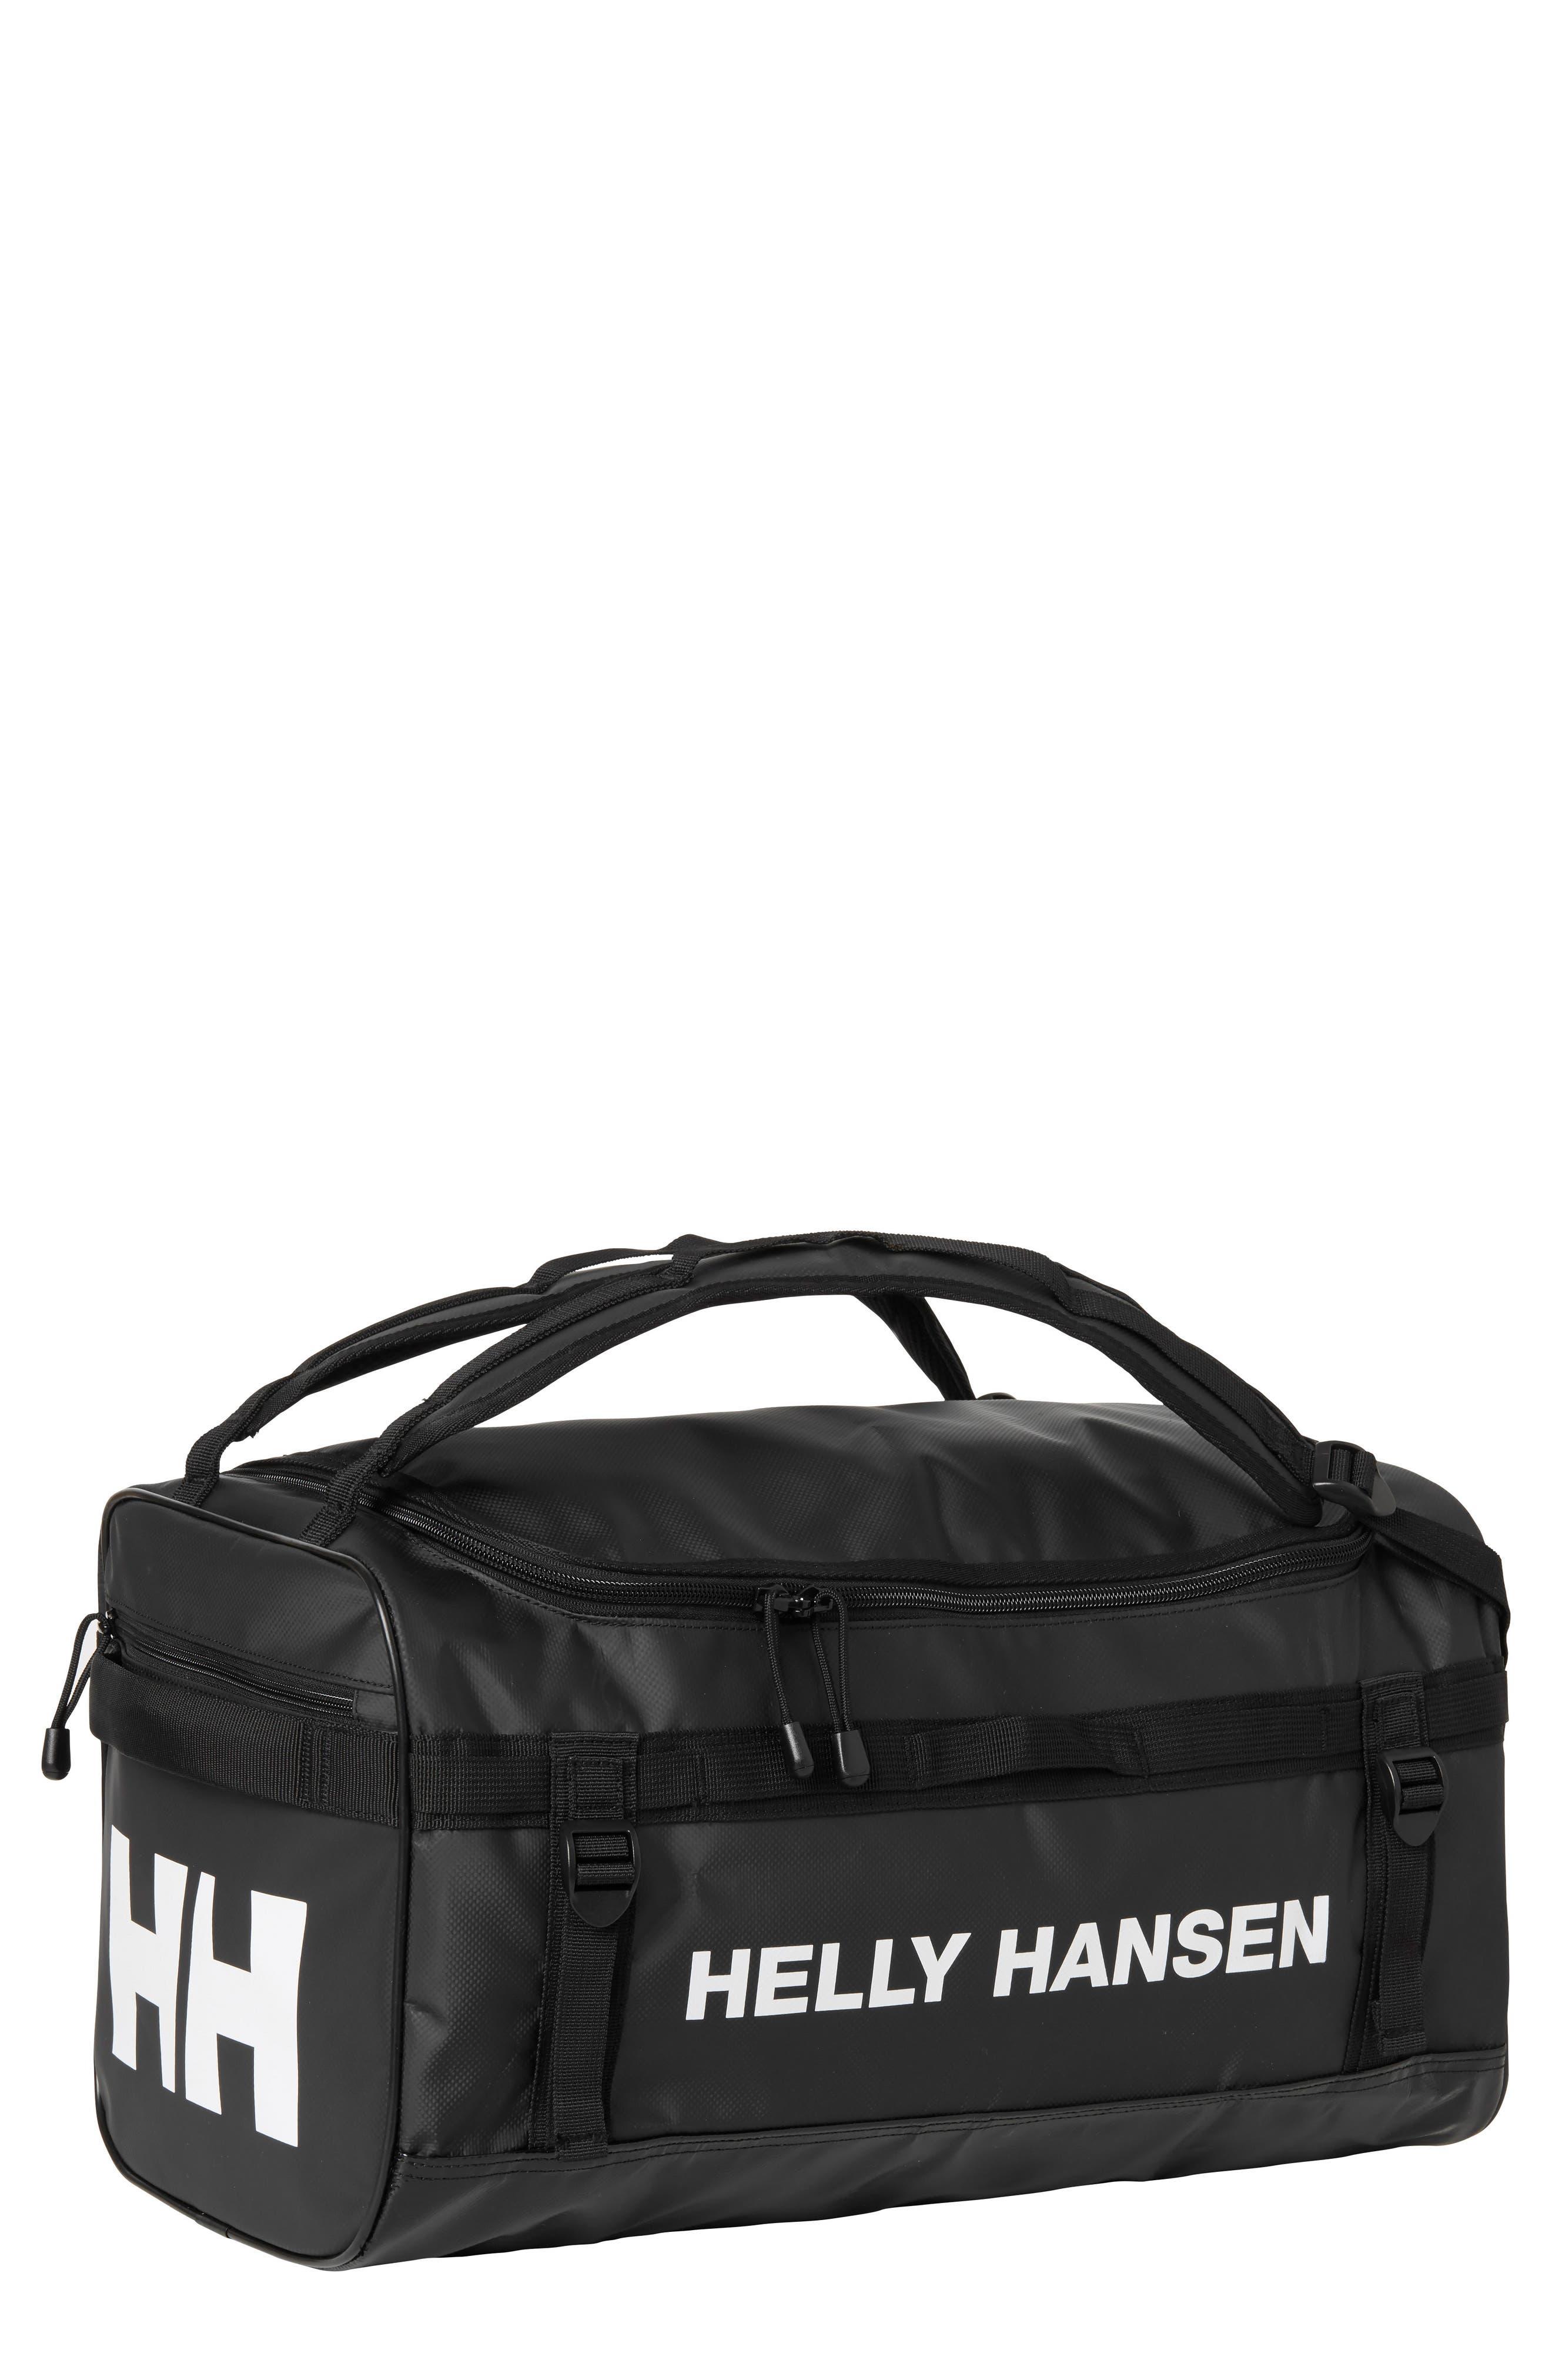 New Classic Extra Small Duffel Bag - Black